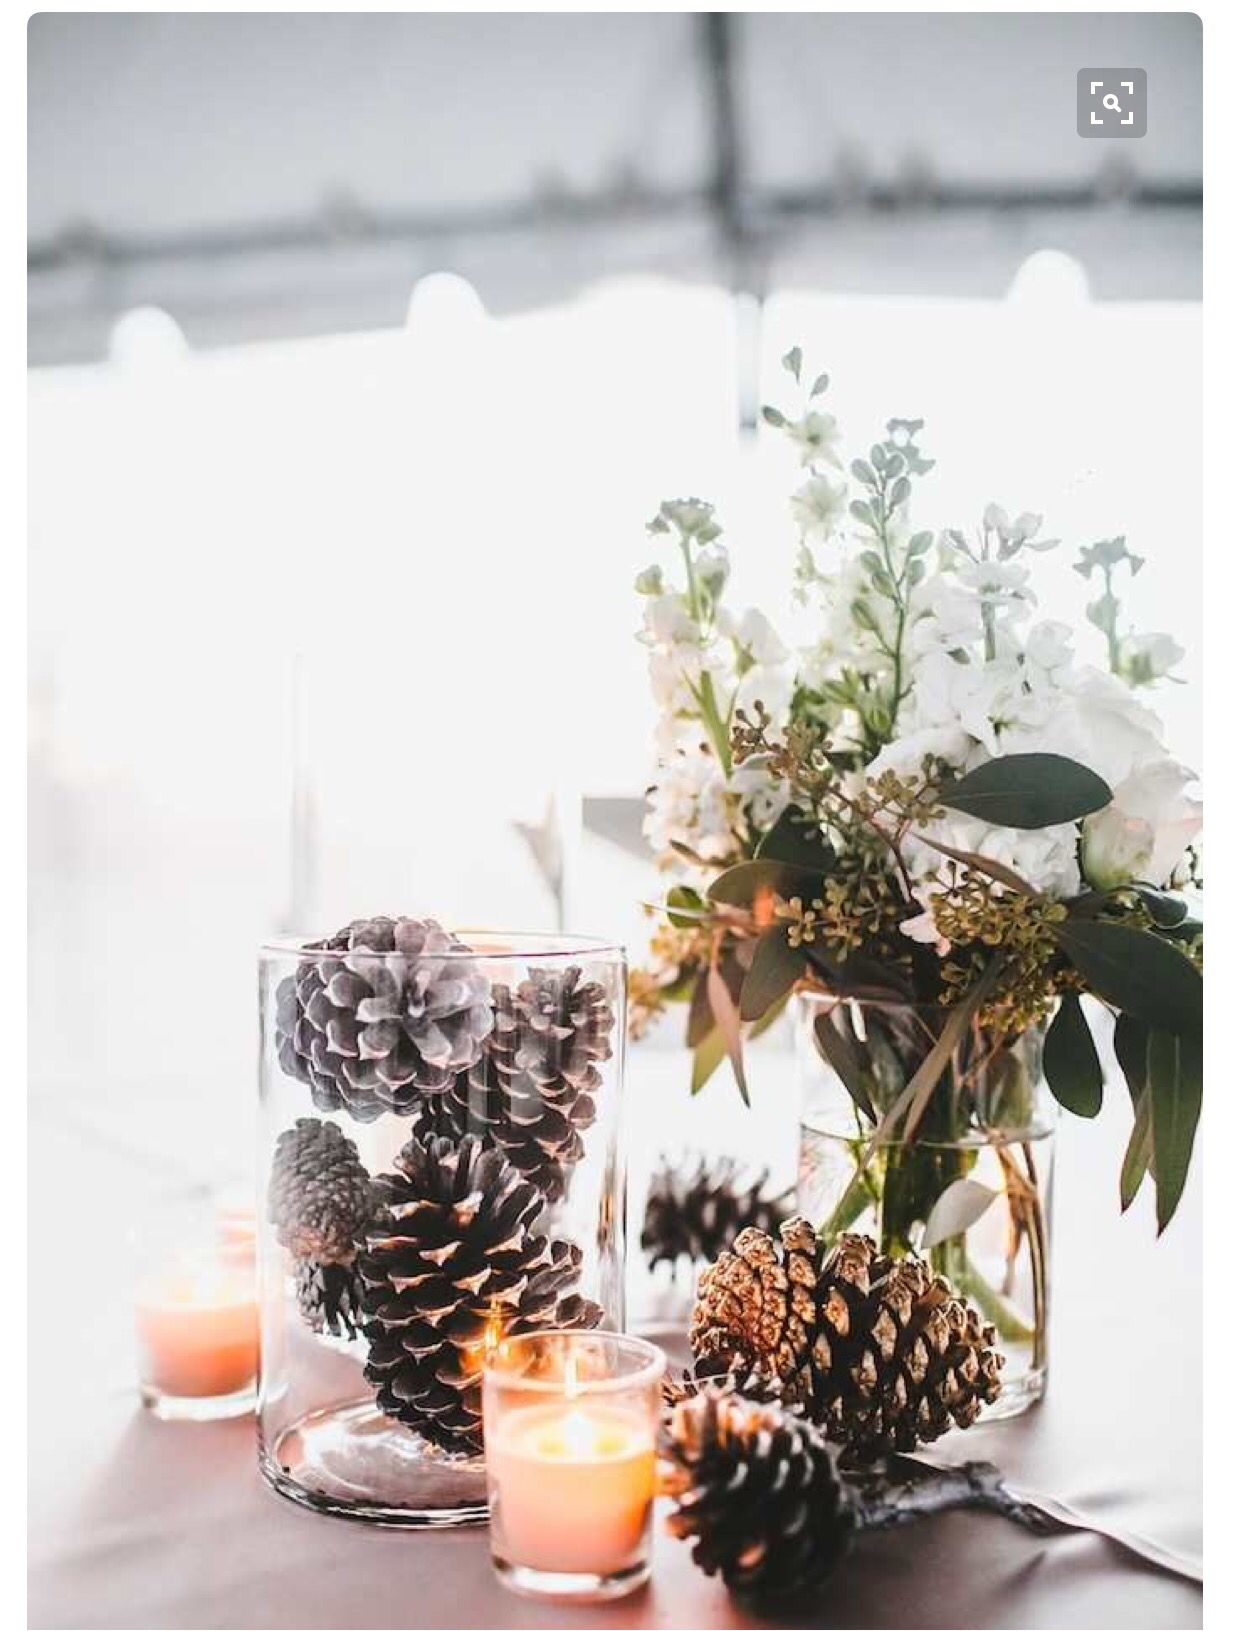 Wedding decorations and ideas december 2018 Pin by Mandi Charles on Wedding Dreams  Pinterest  Winter weddings